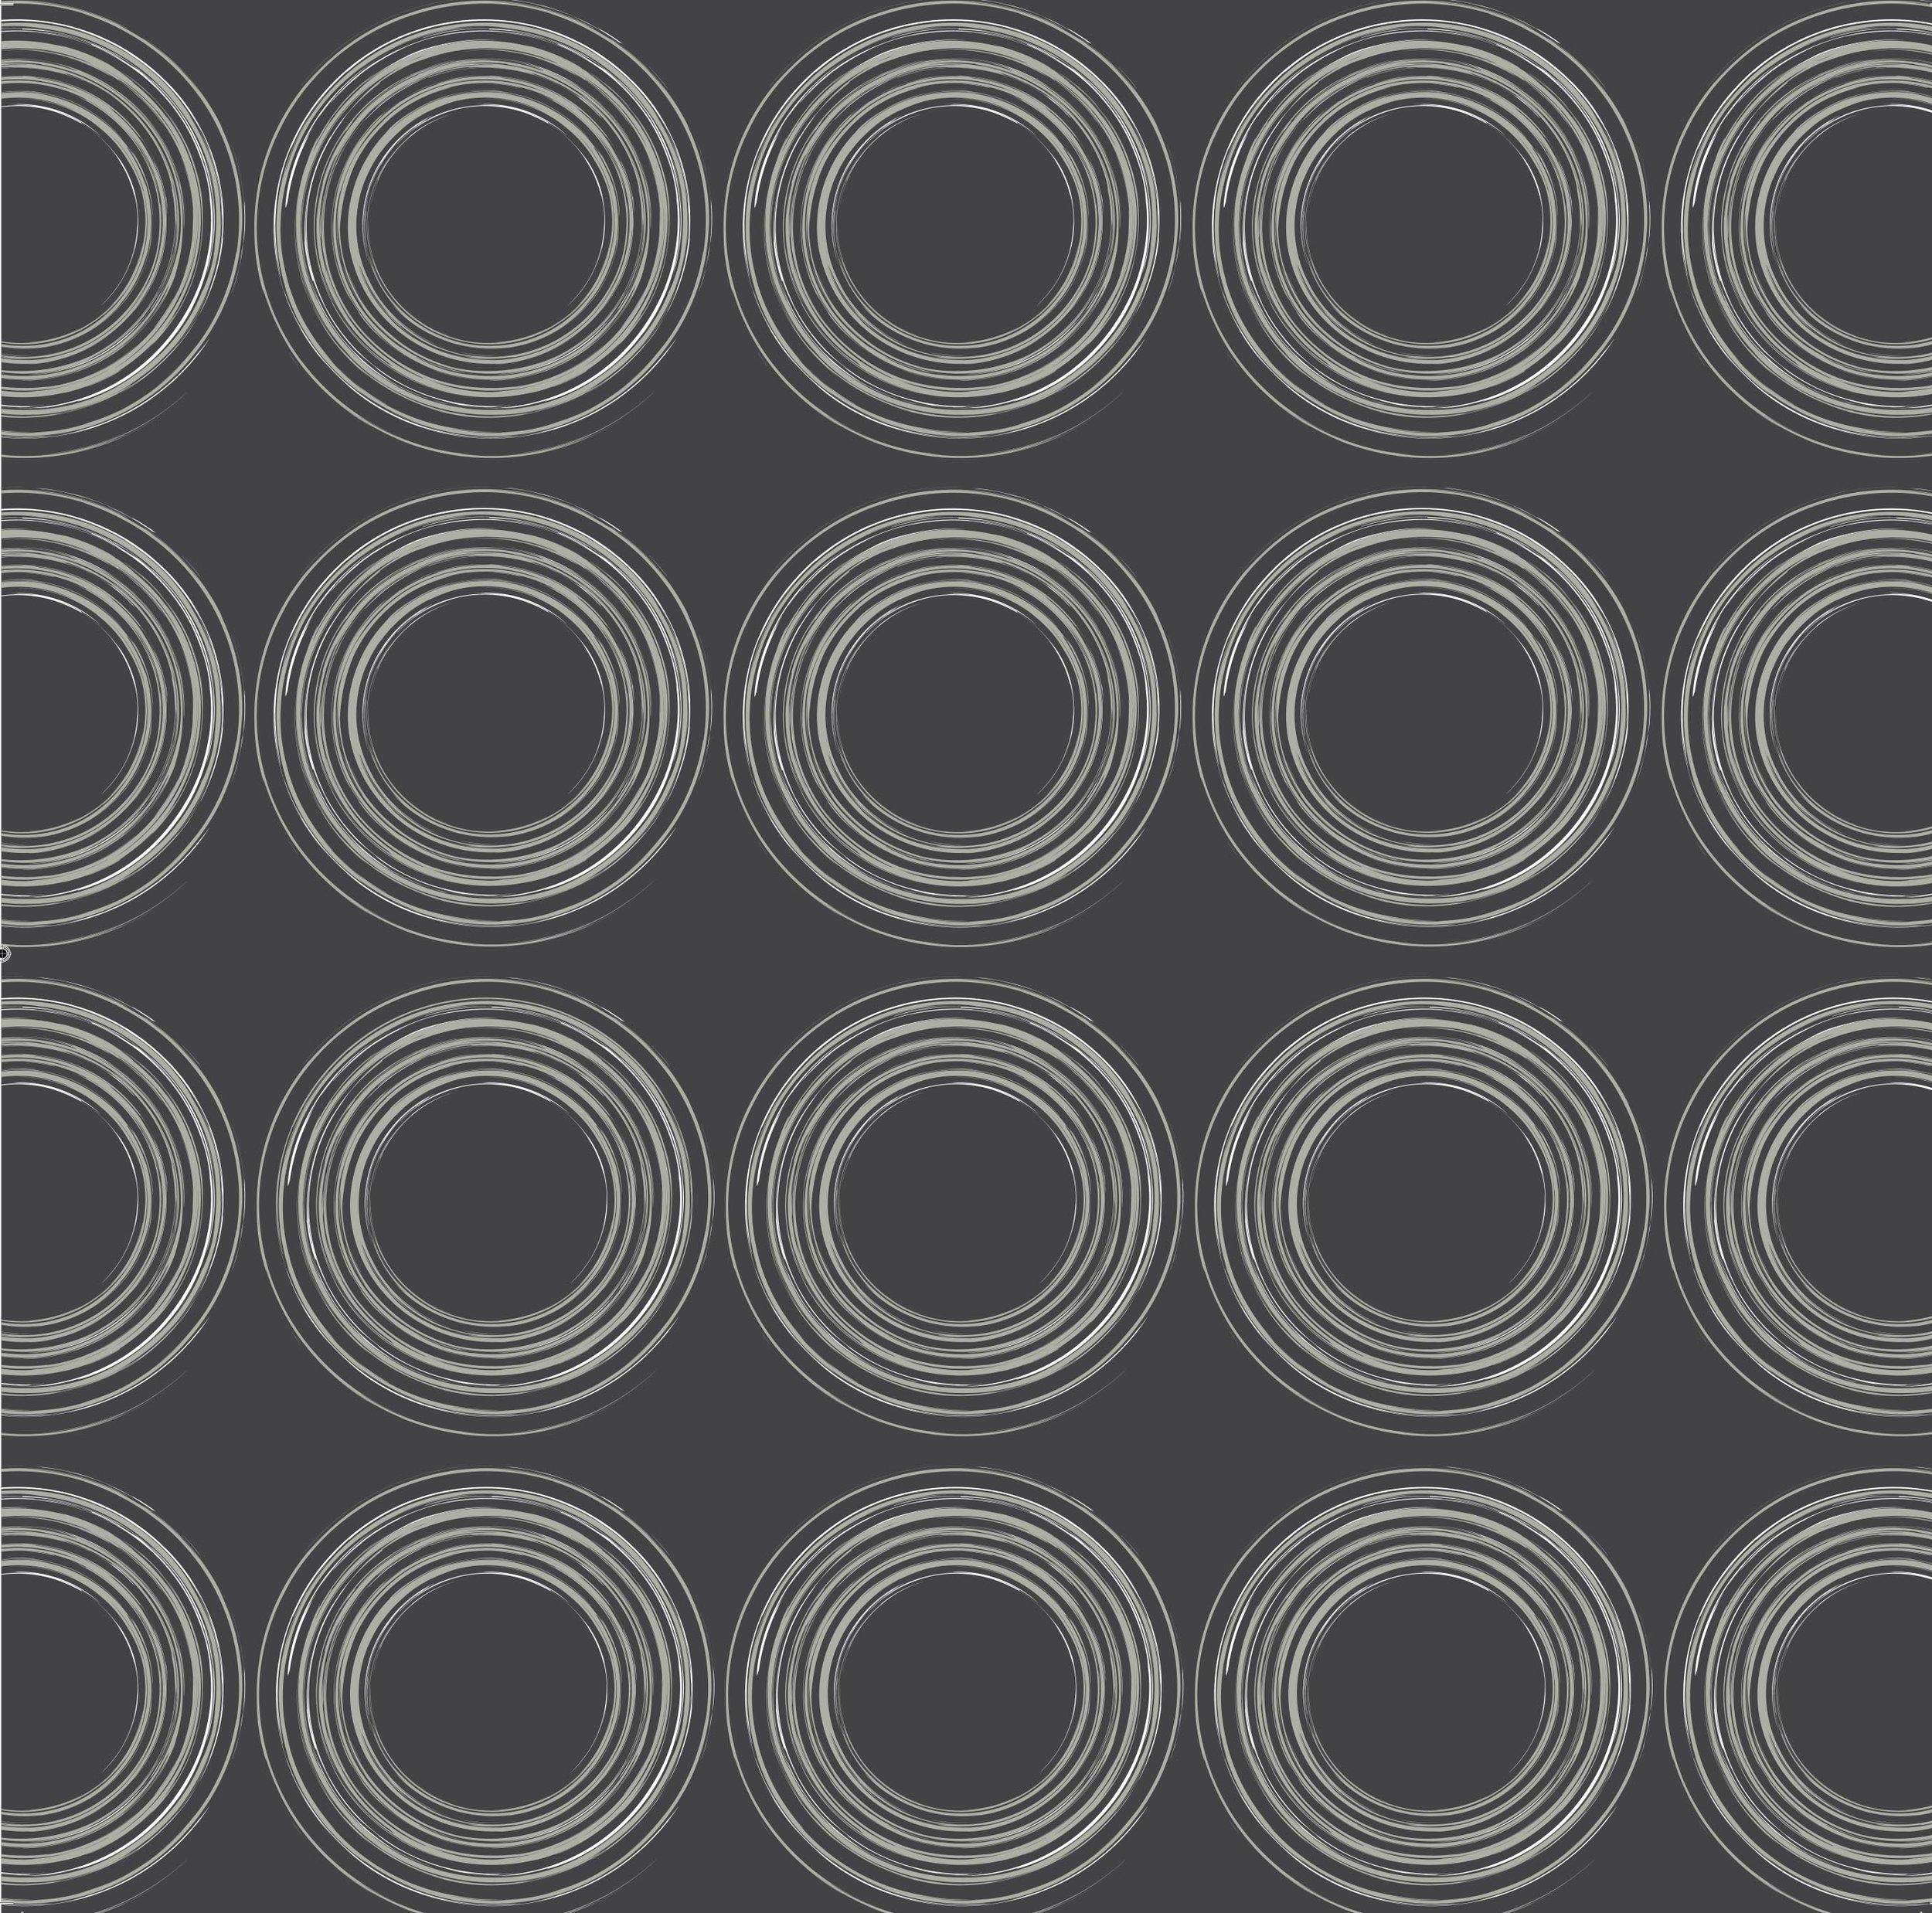 No 9 Cusion circle grey big dark back copy.jpg